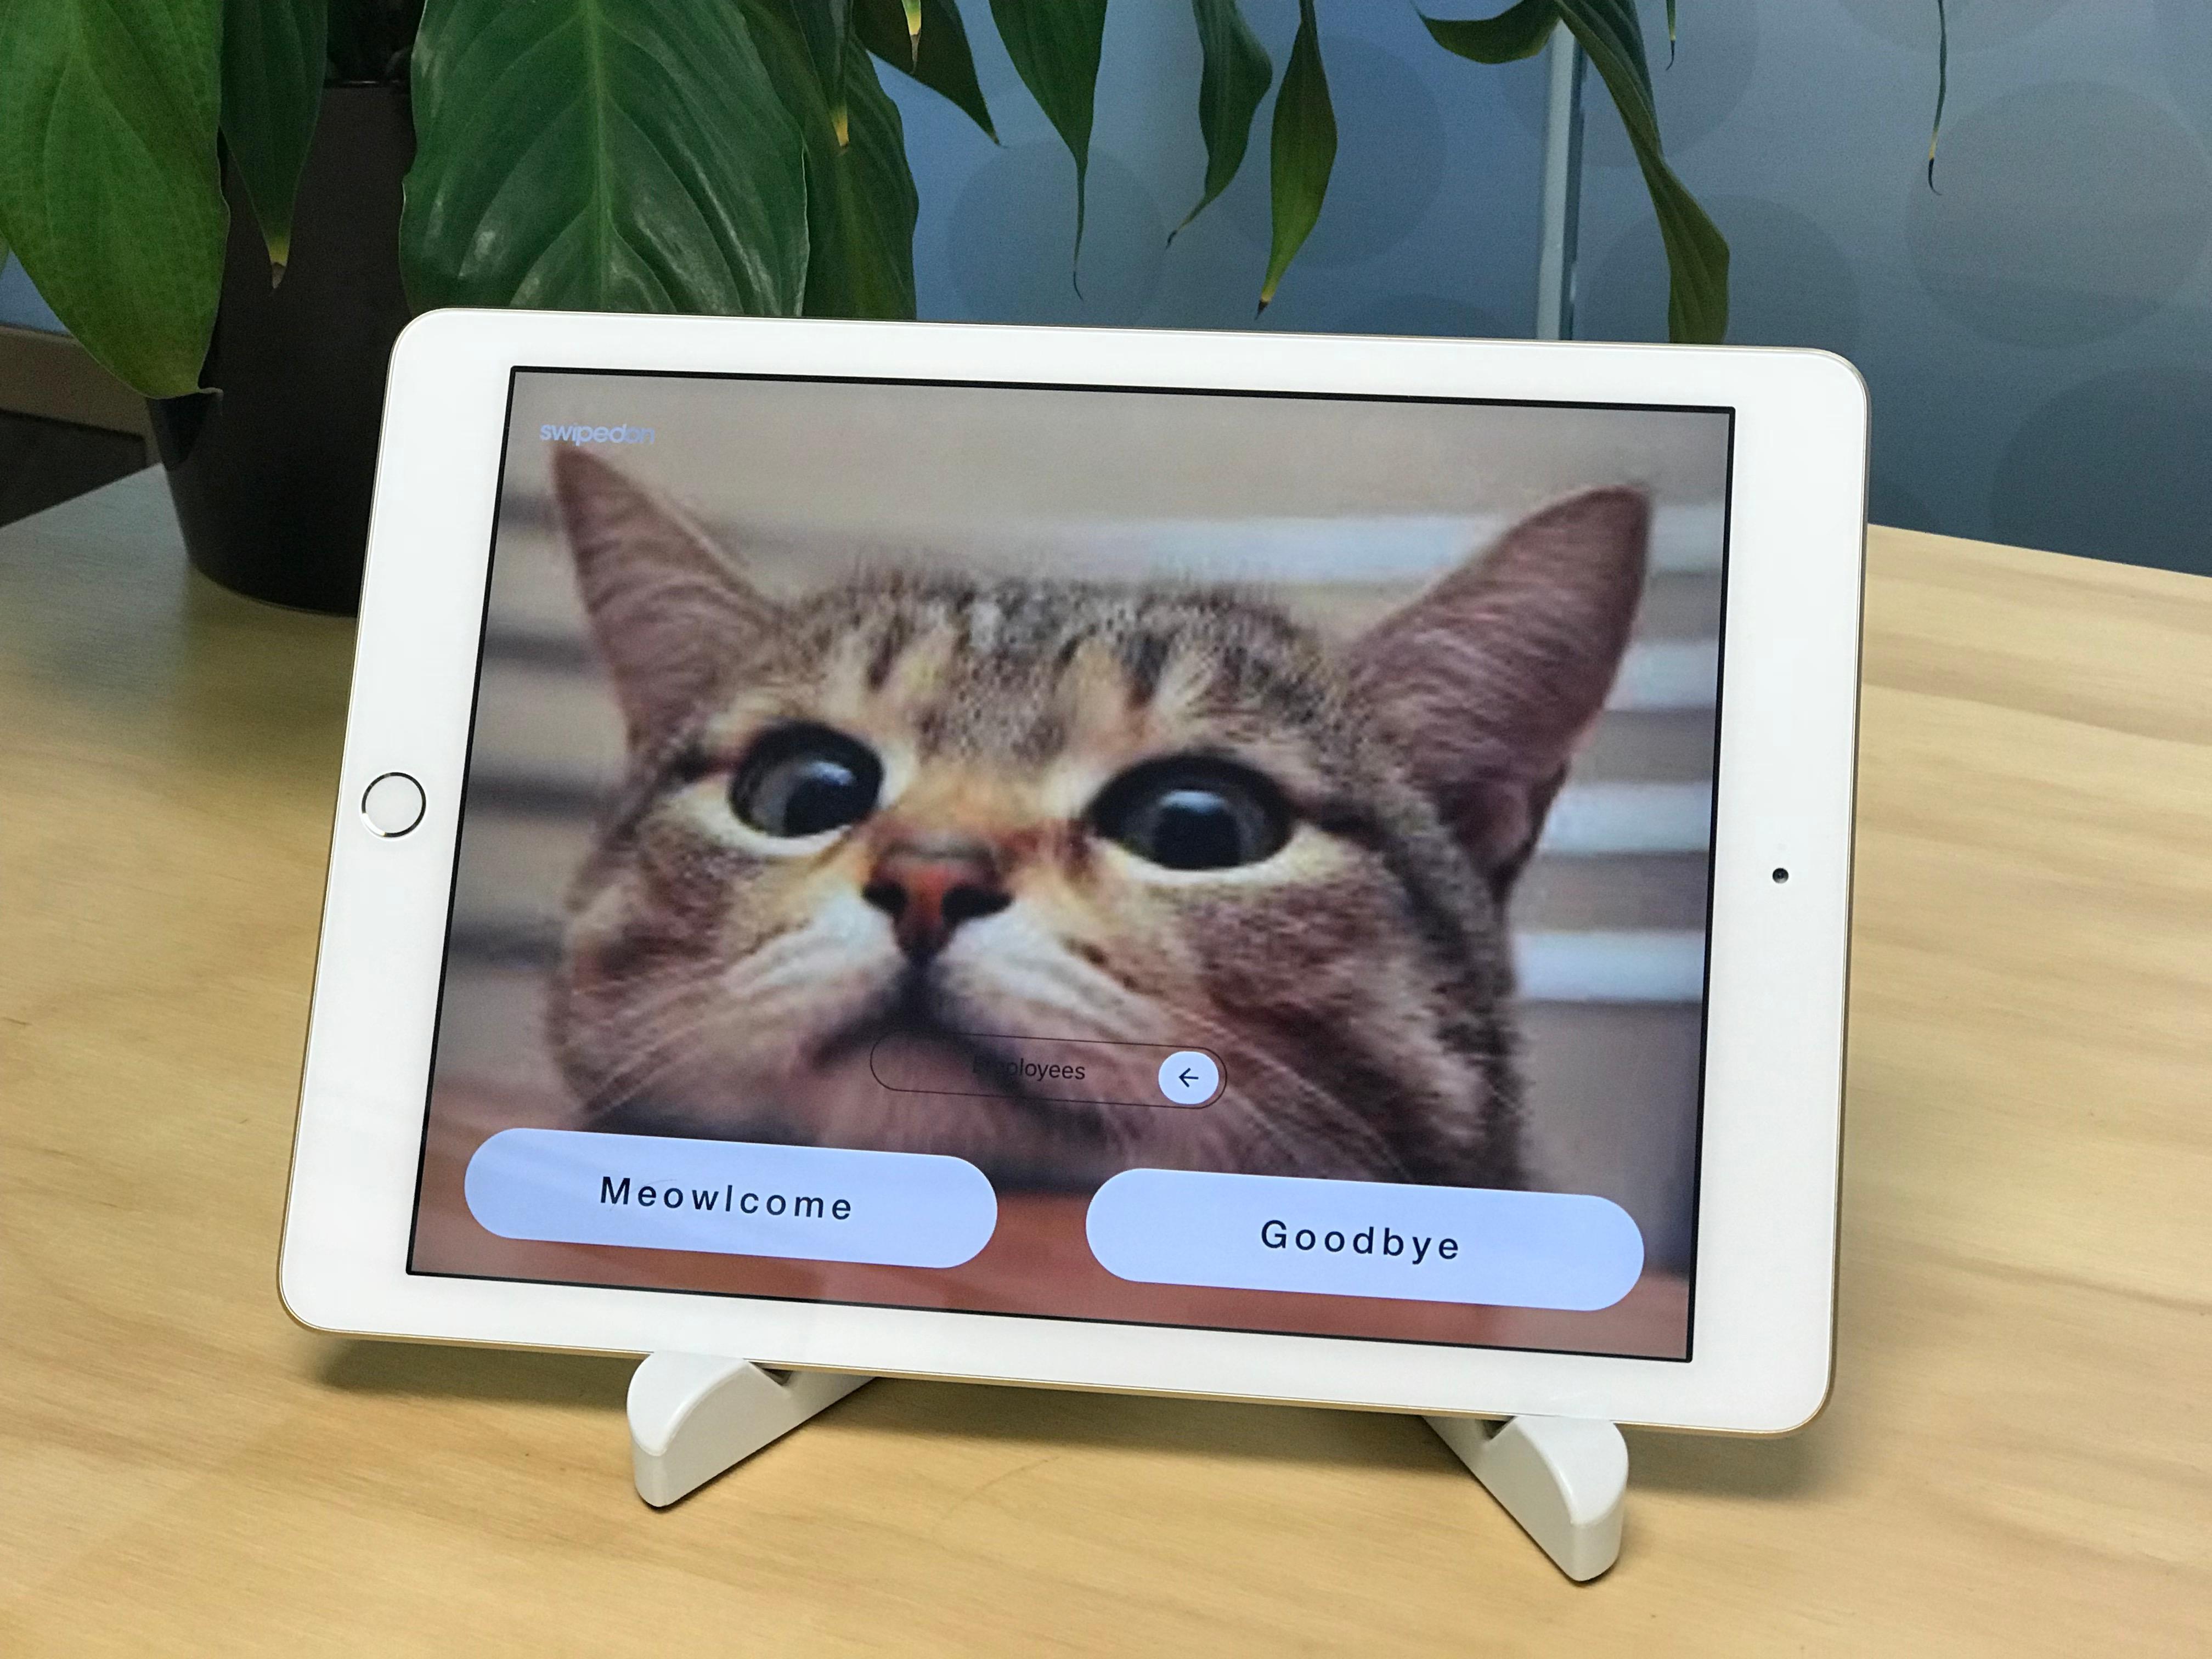 Cat screen saver